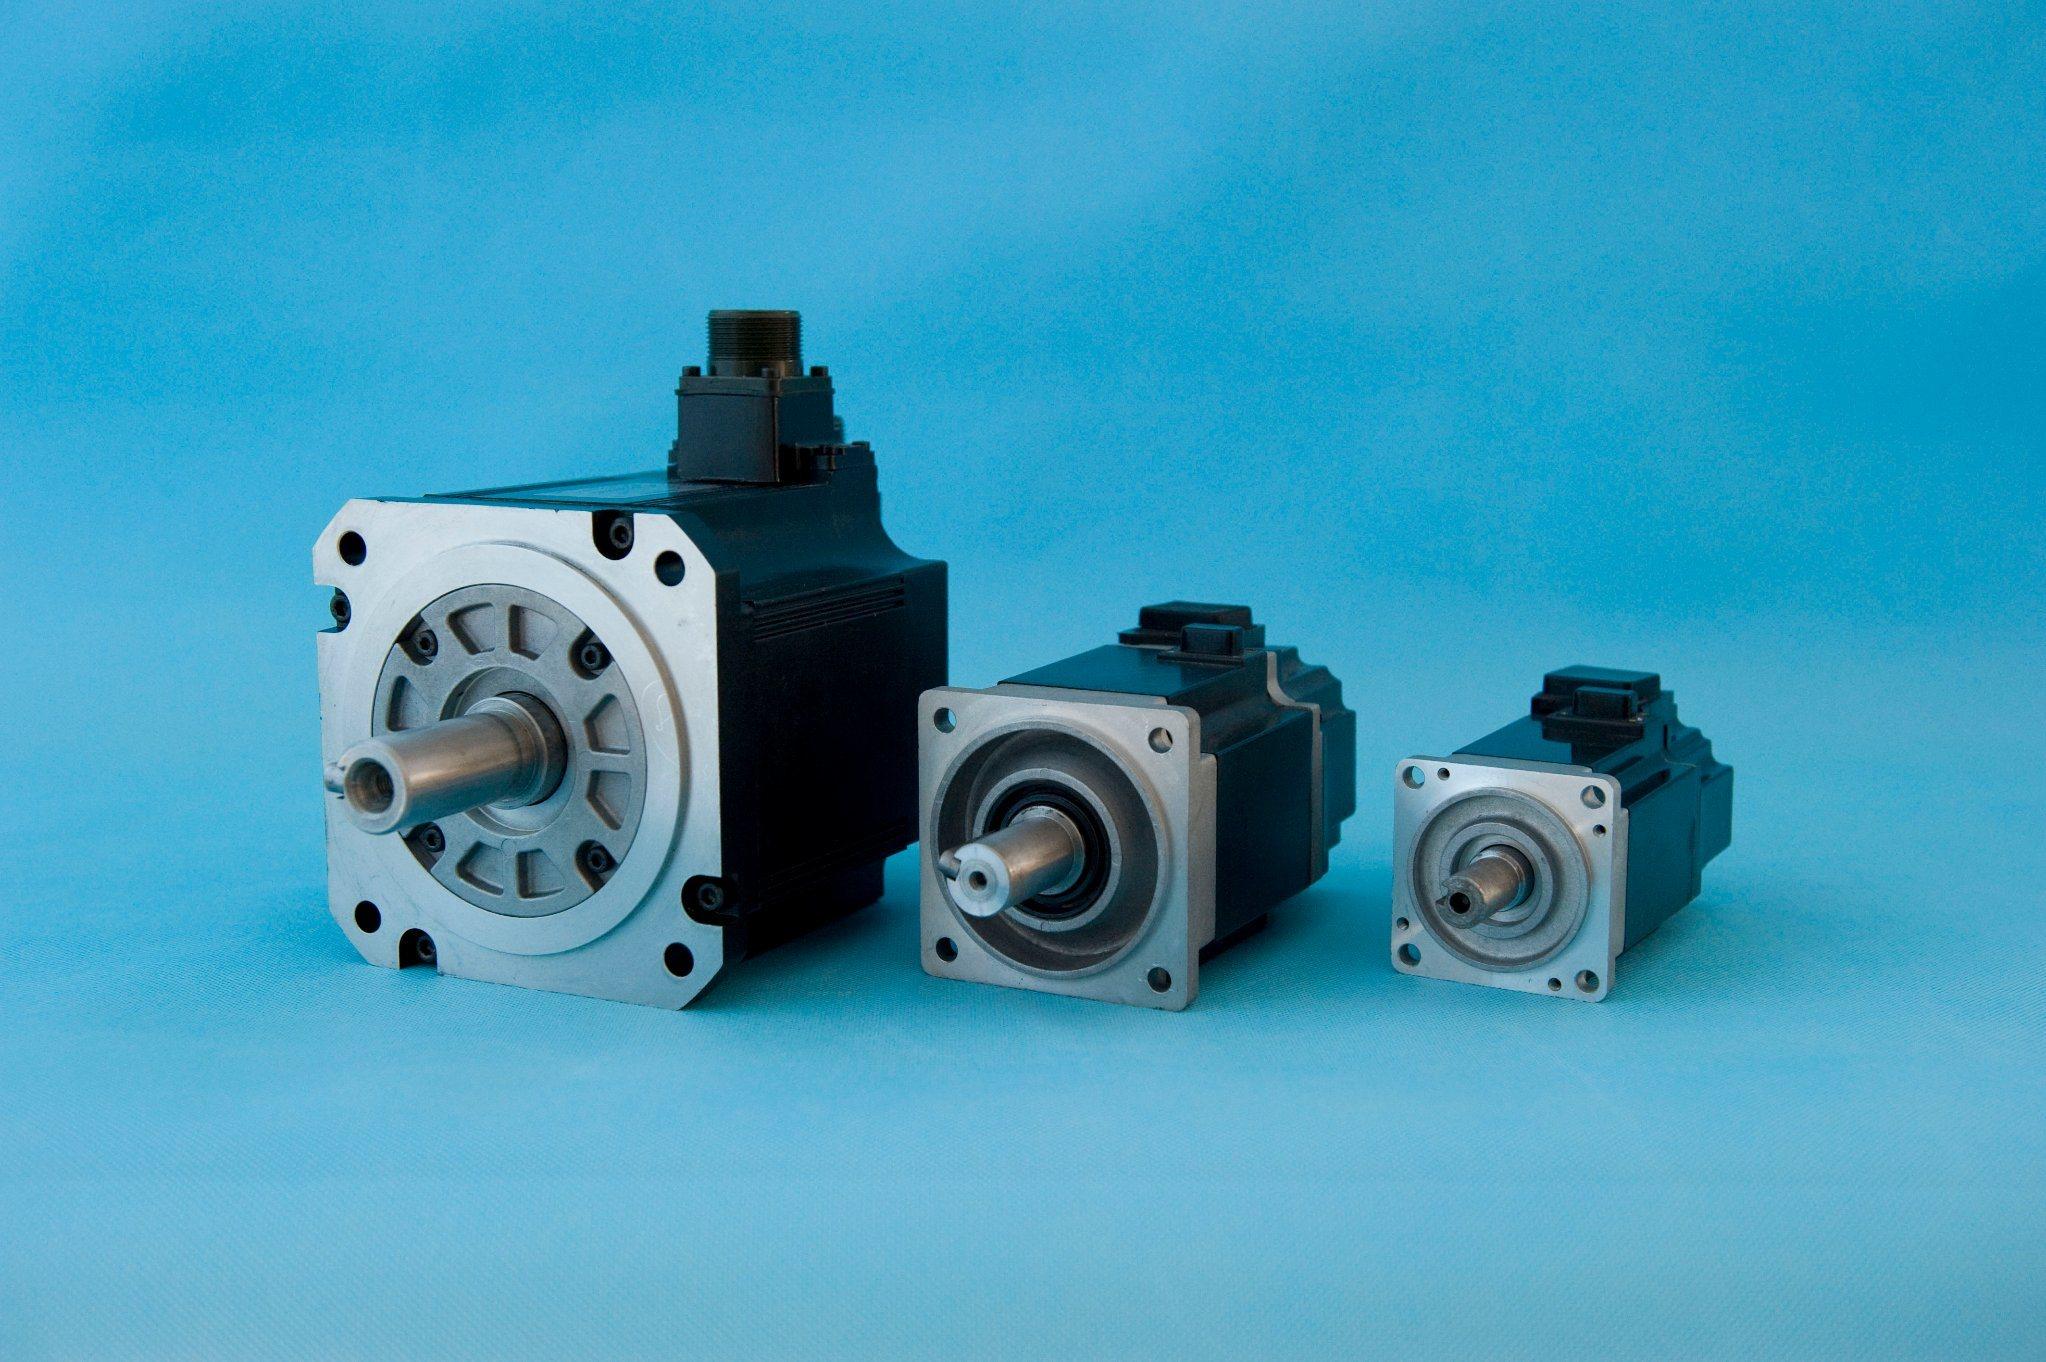 Msd100 Series Motor Servo for CNC Milling Machine 3.8kw